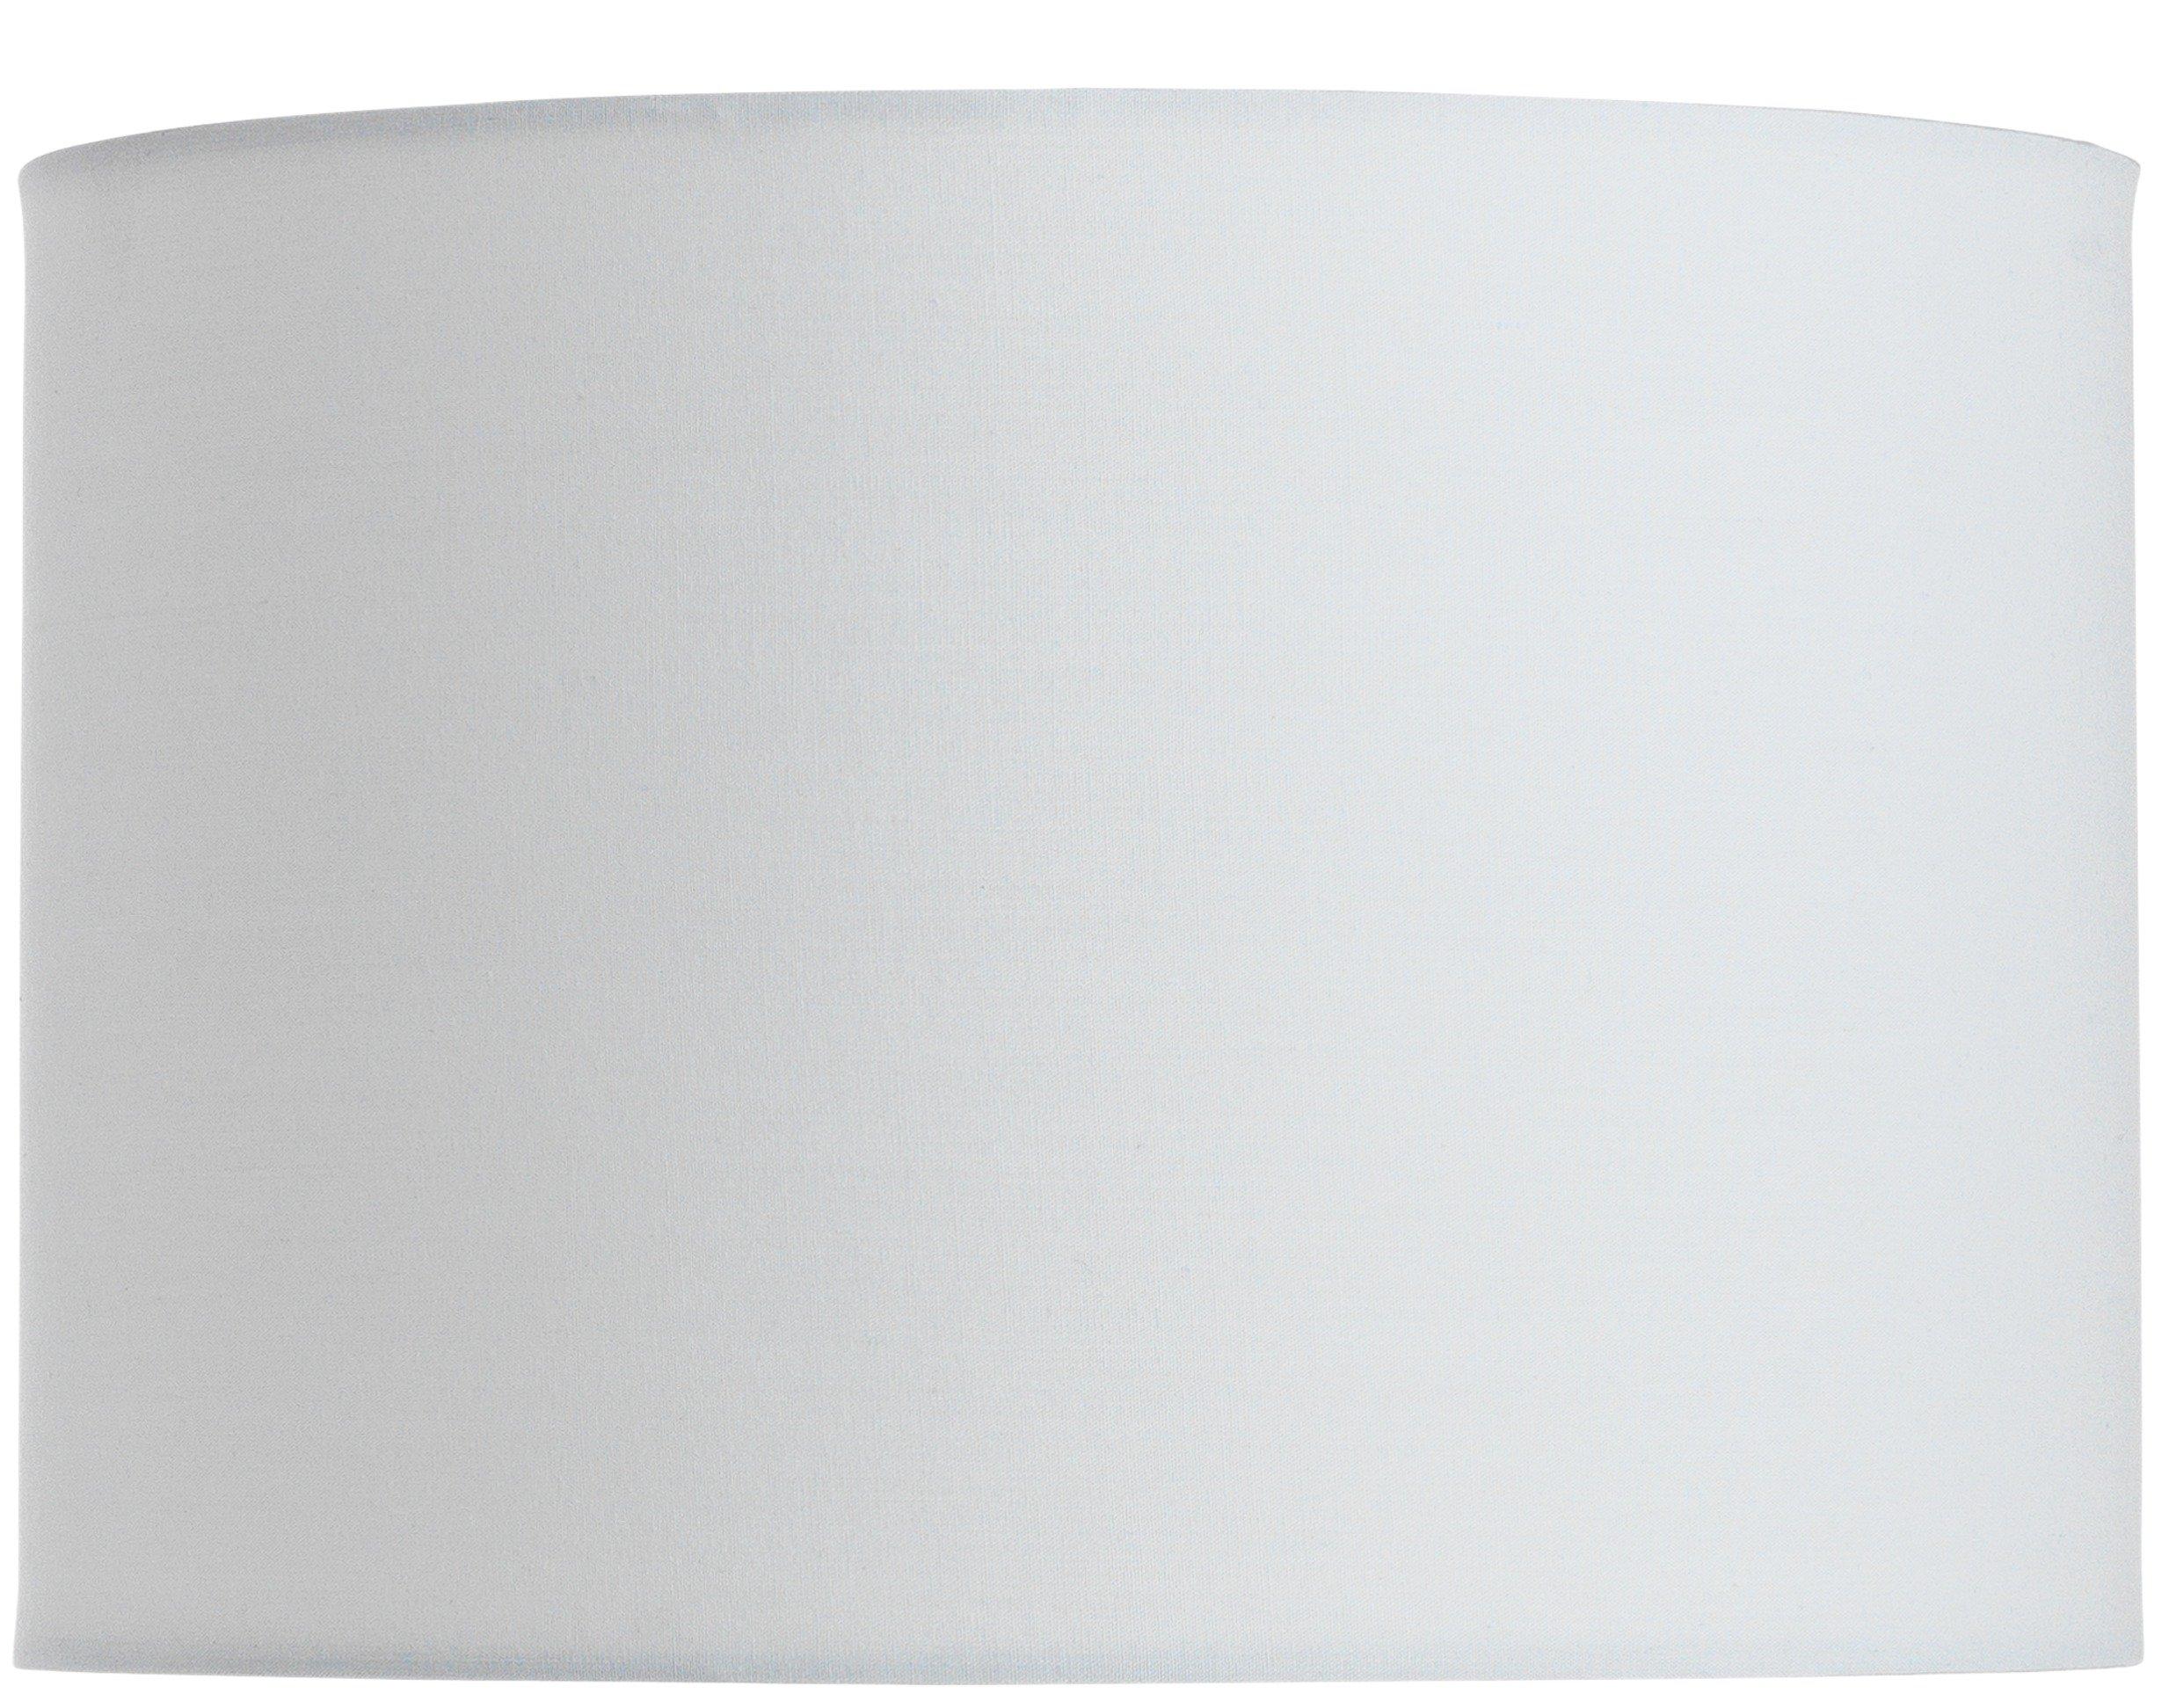 Argos Home Drum Light Shade - Super White